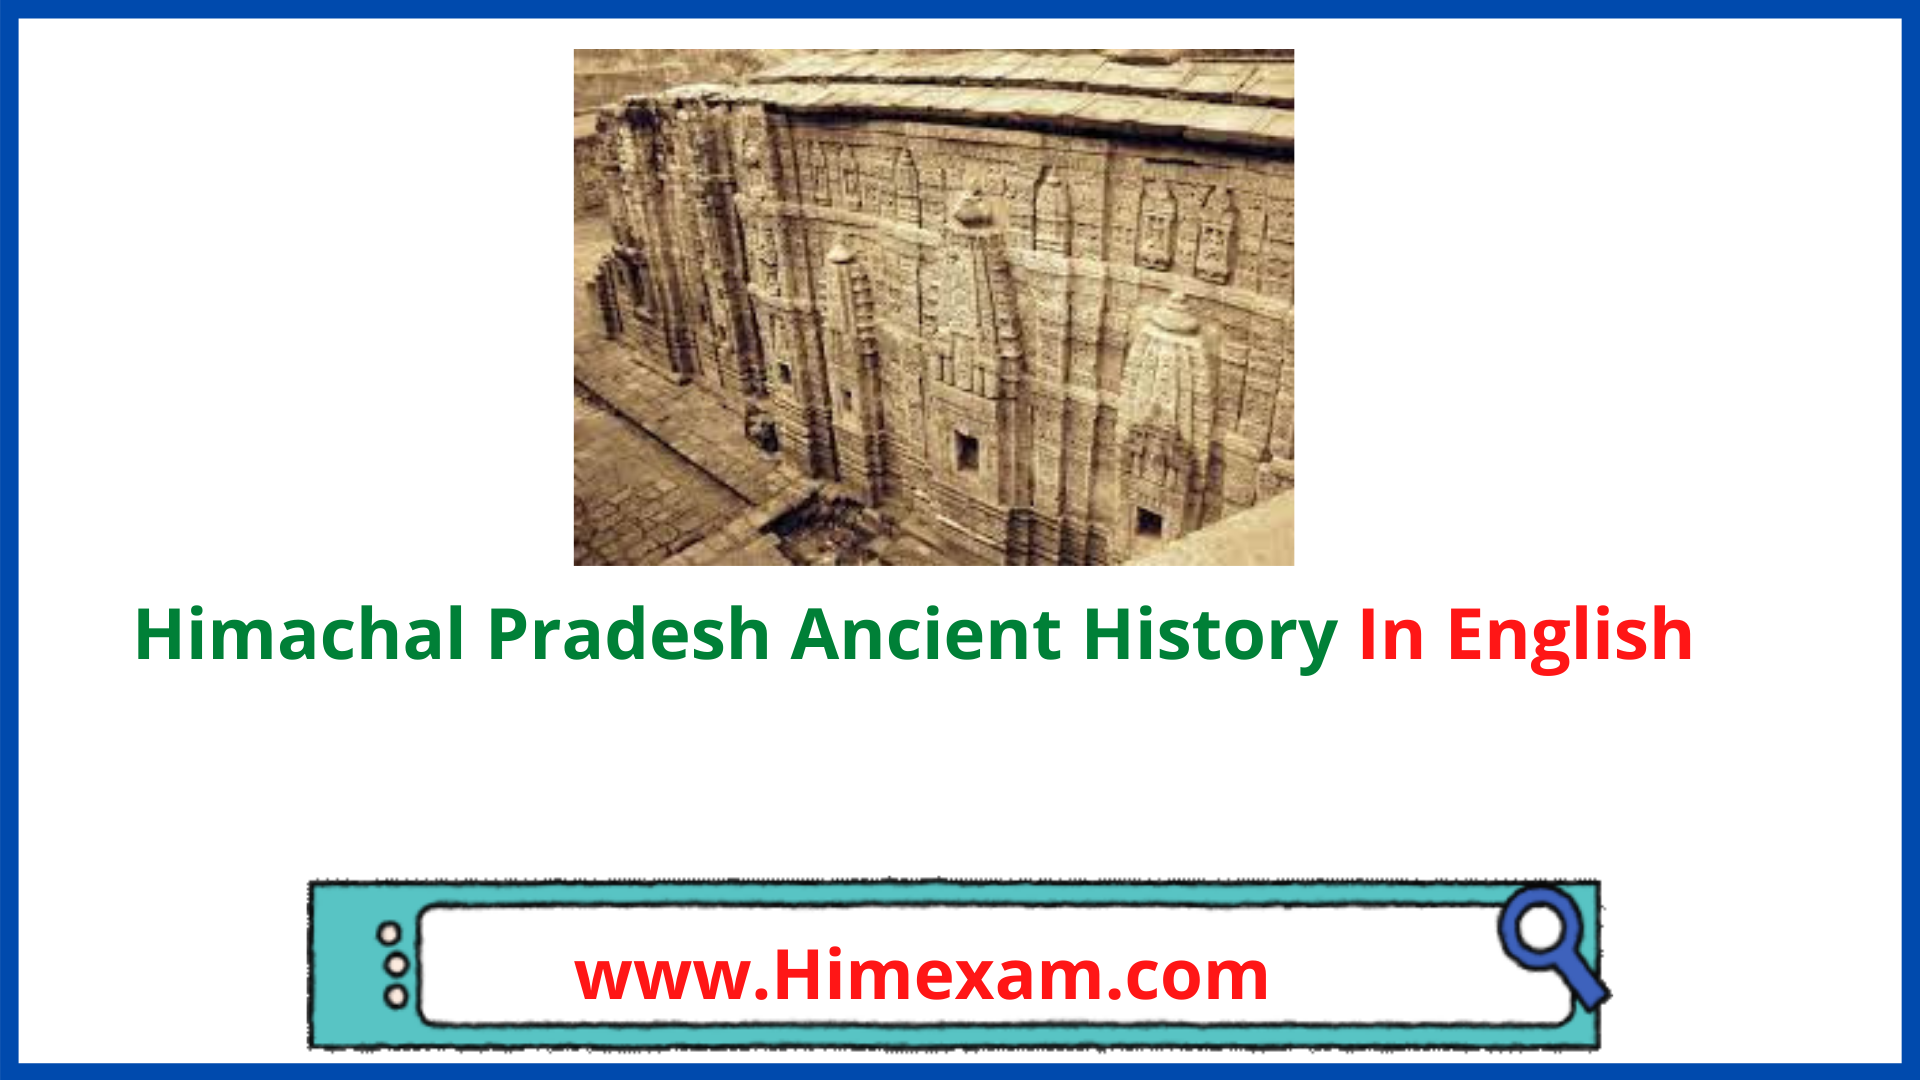 Himachal Pradesh Ancient History